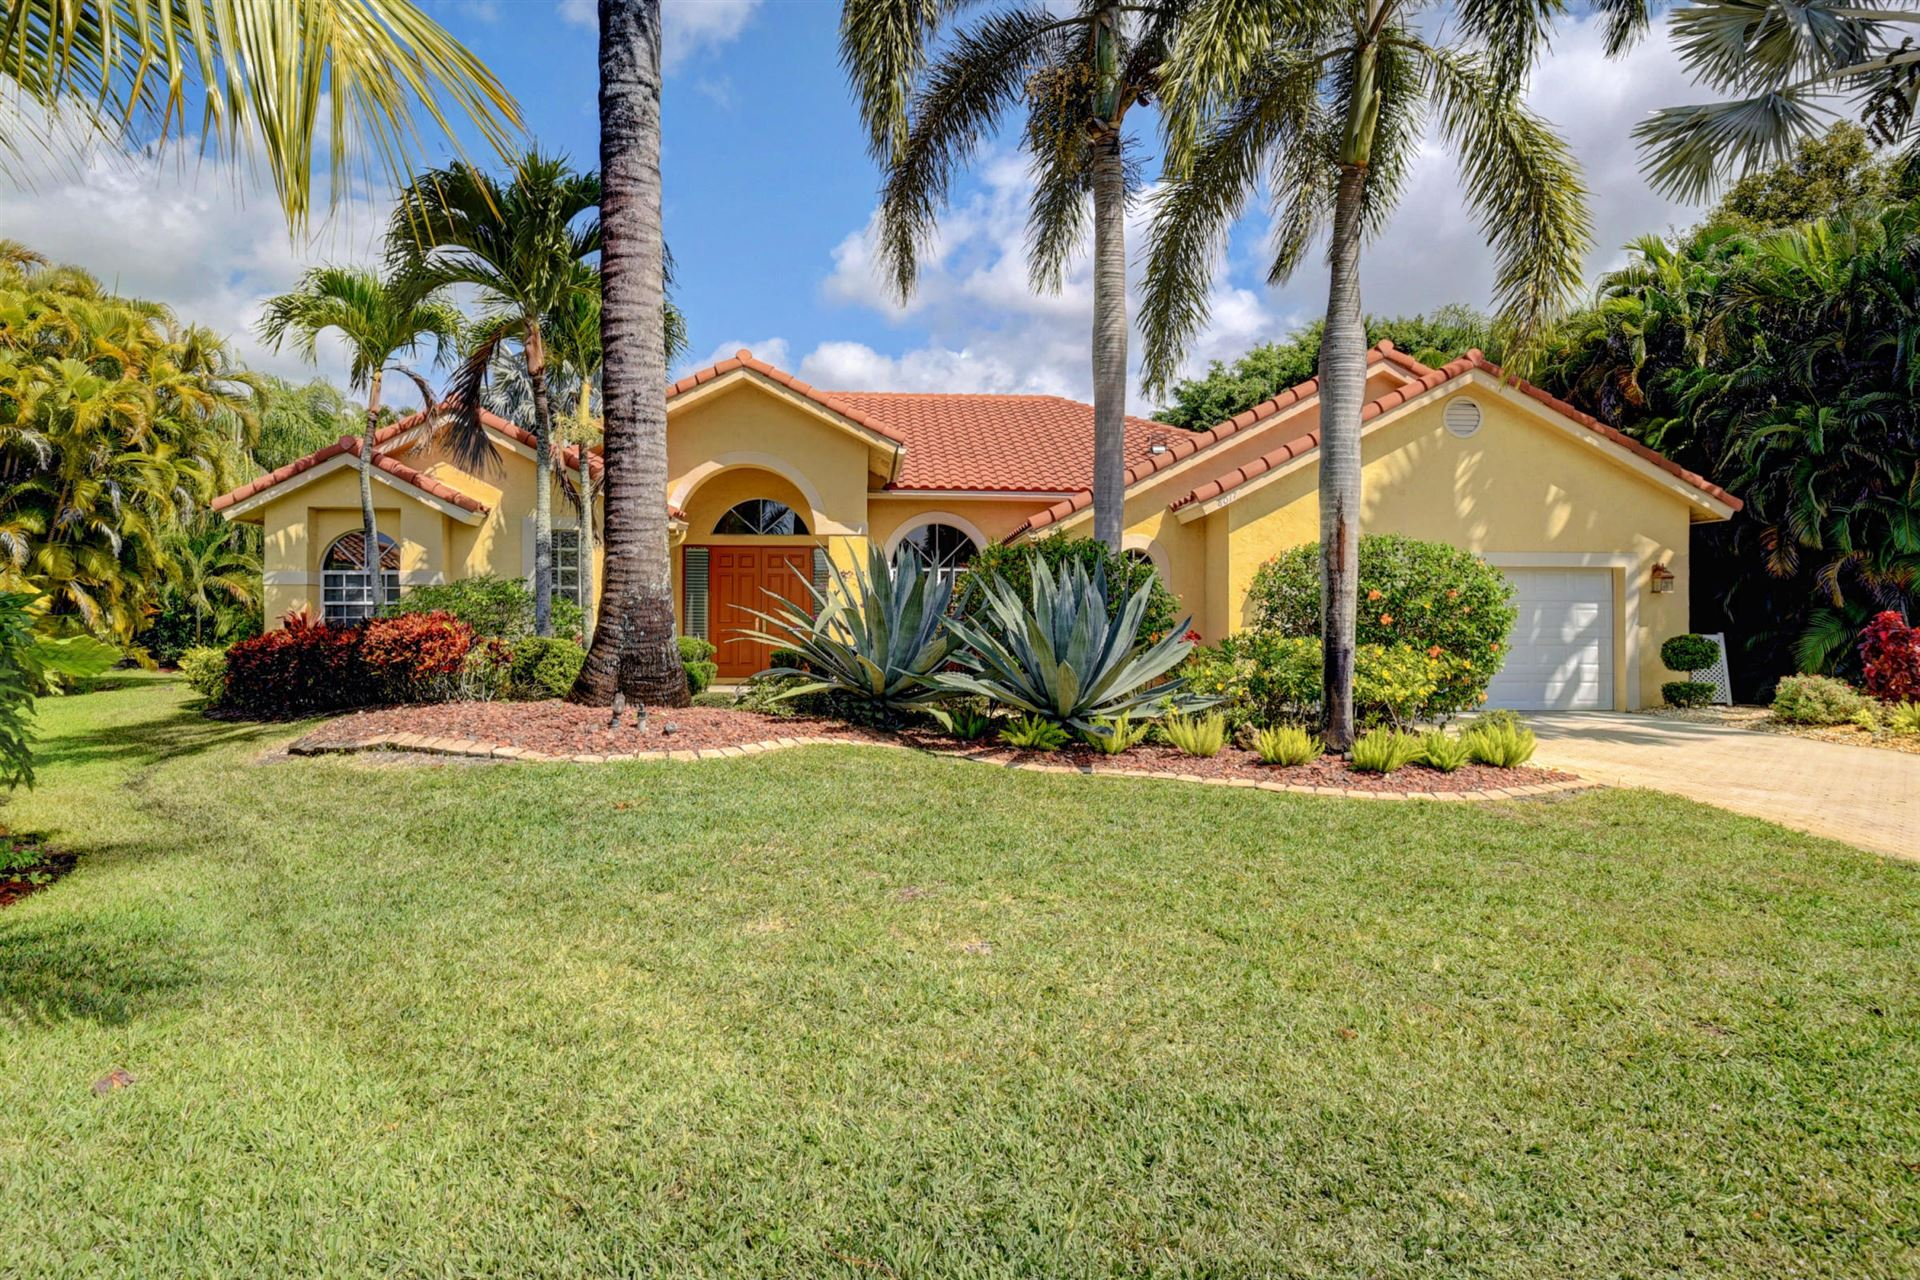 Photo of 8017 Desmond Drive, Boynton Beach, FL 33472 (MLS # RX-10613097)